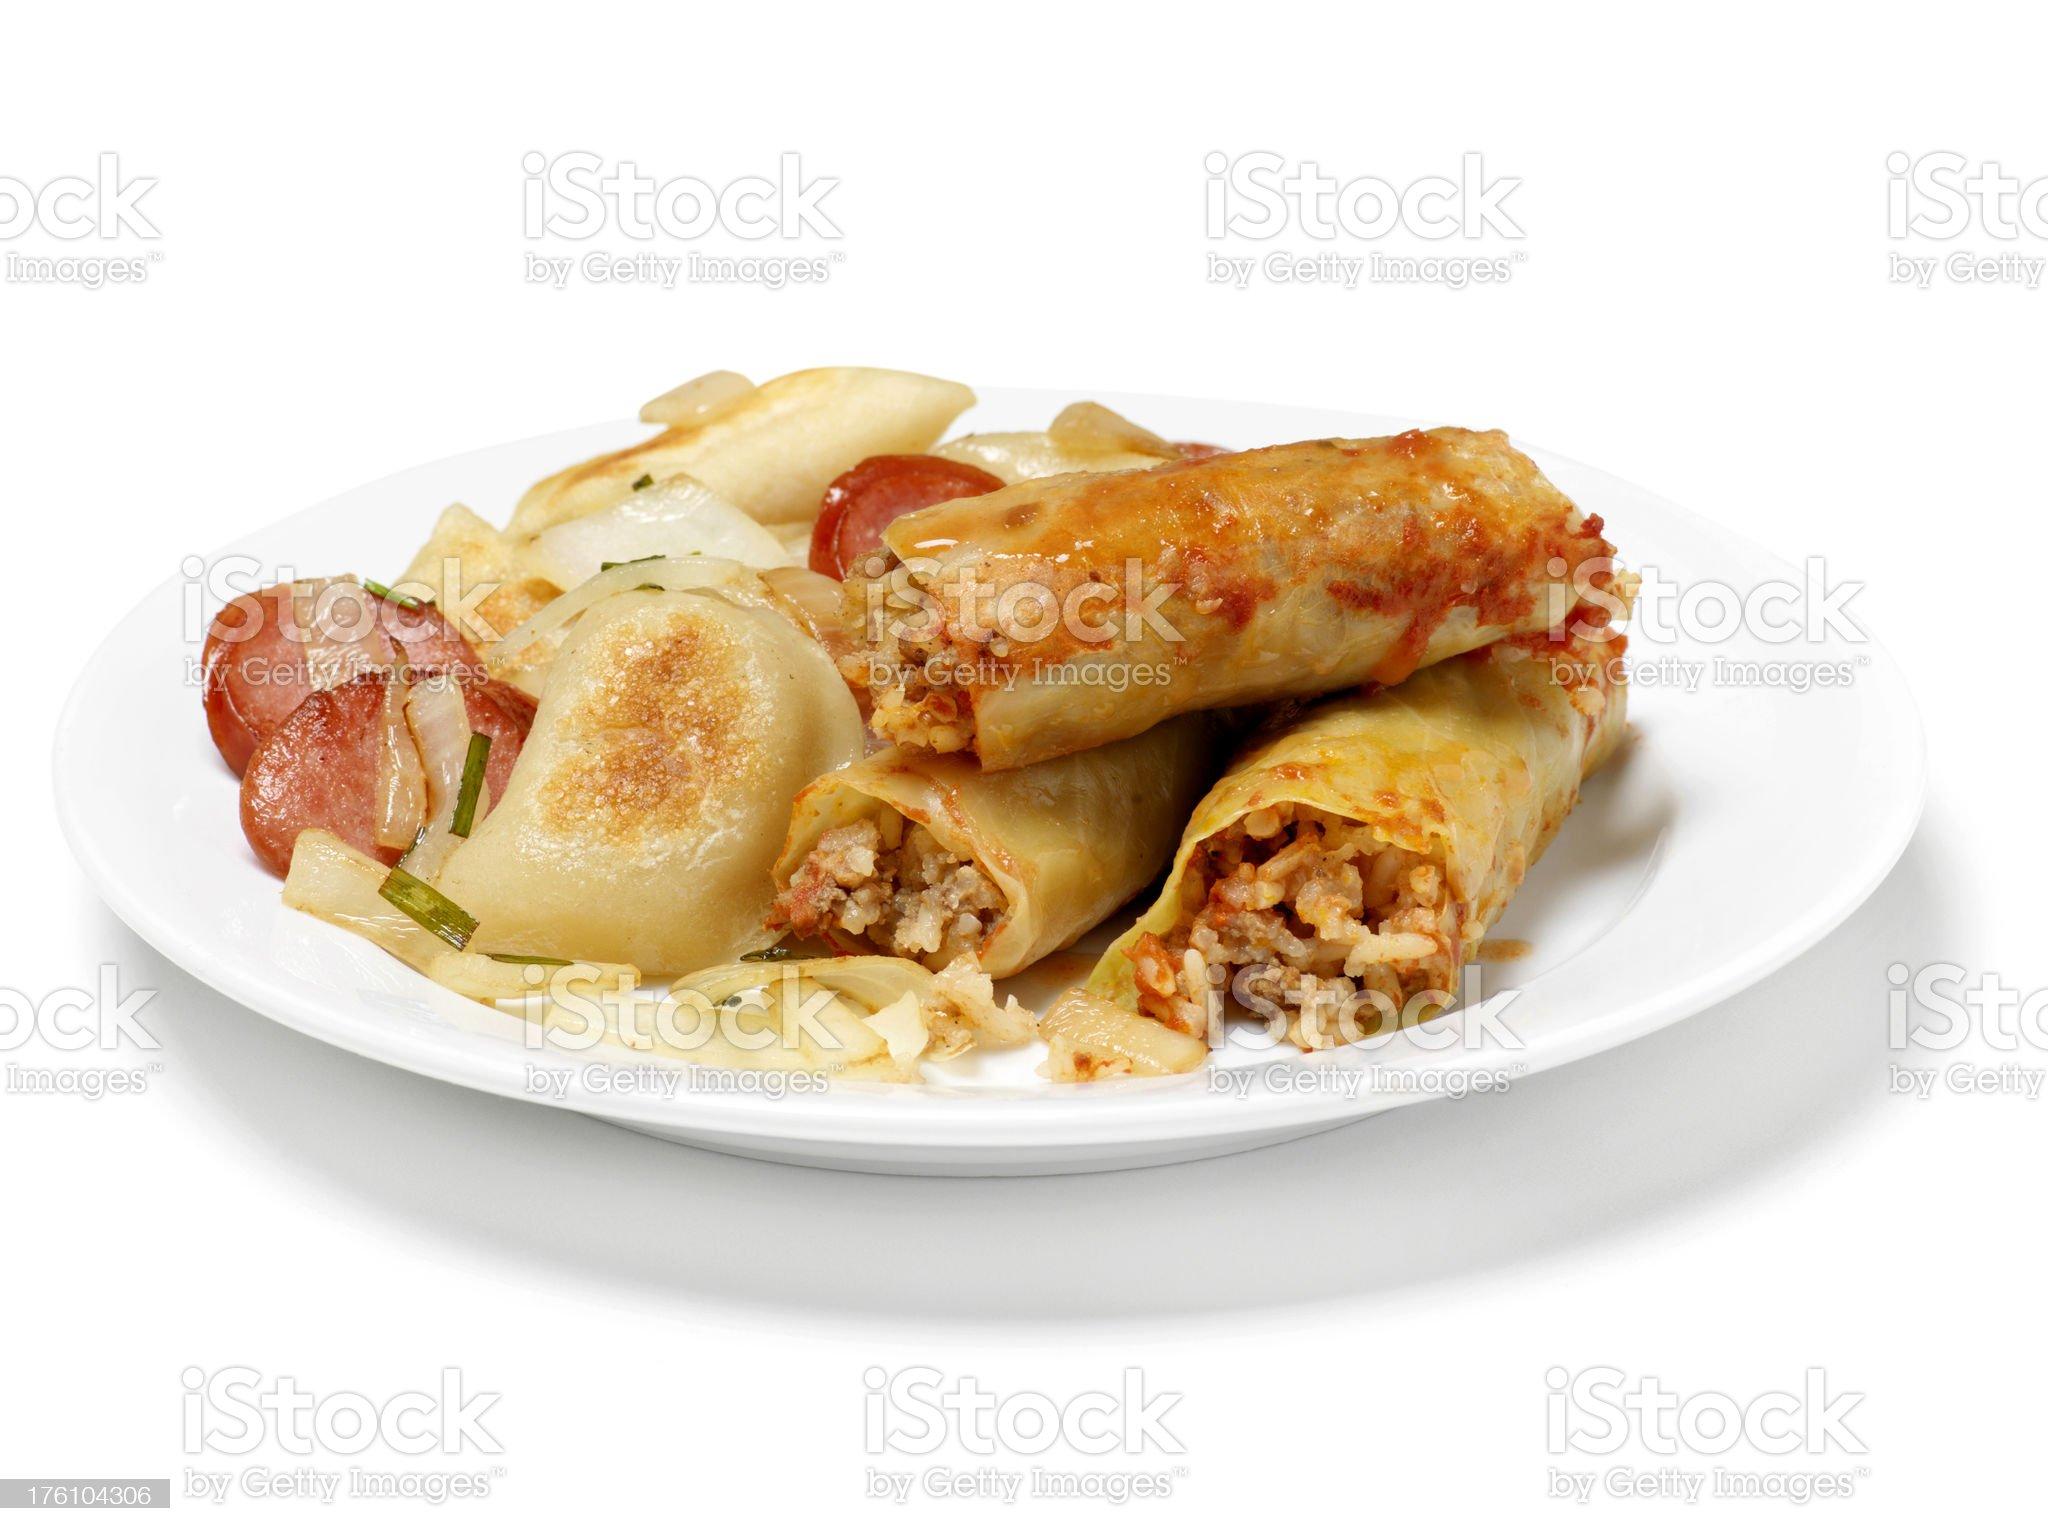 Ukrainian Pan Fried Perogies royalty-free stock photo